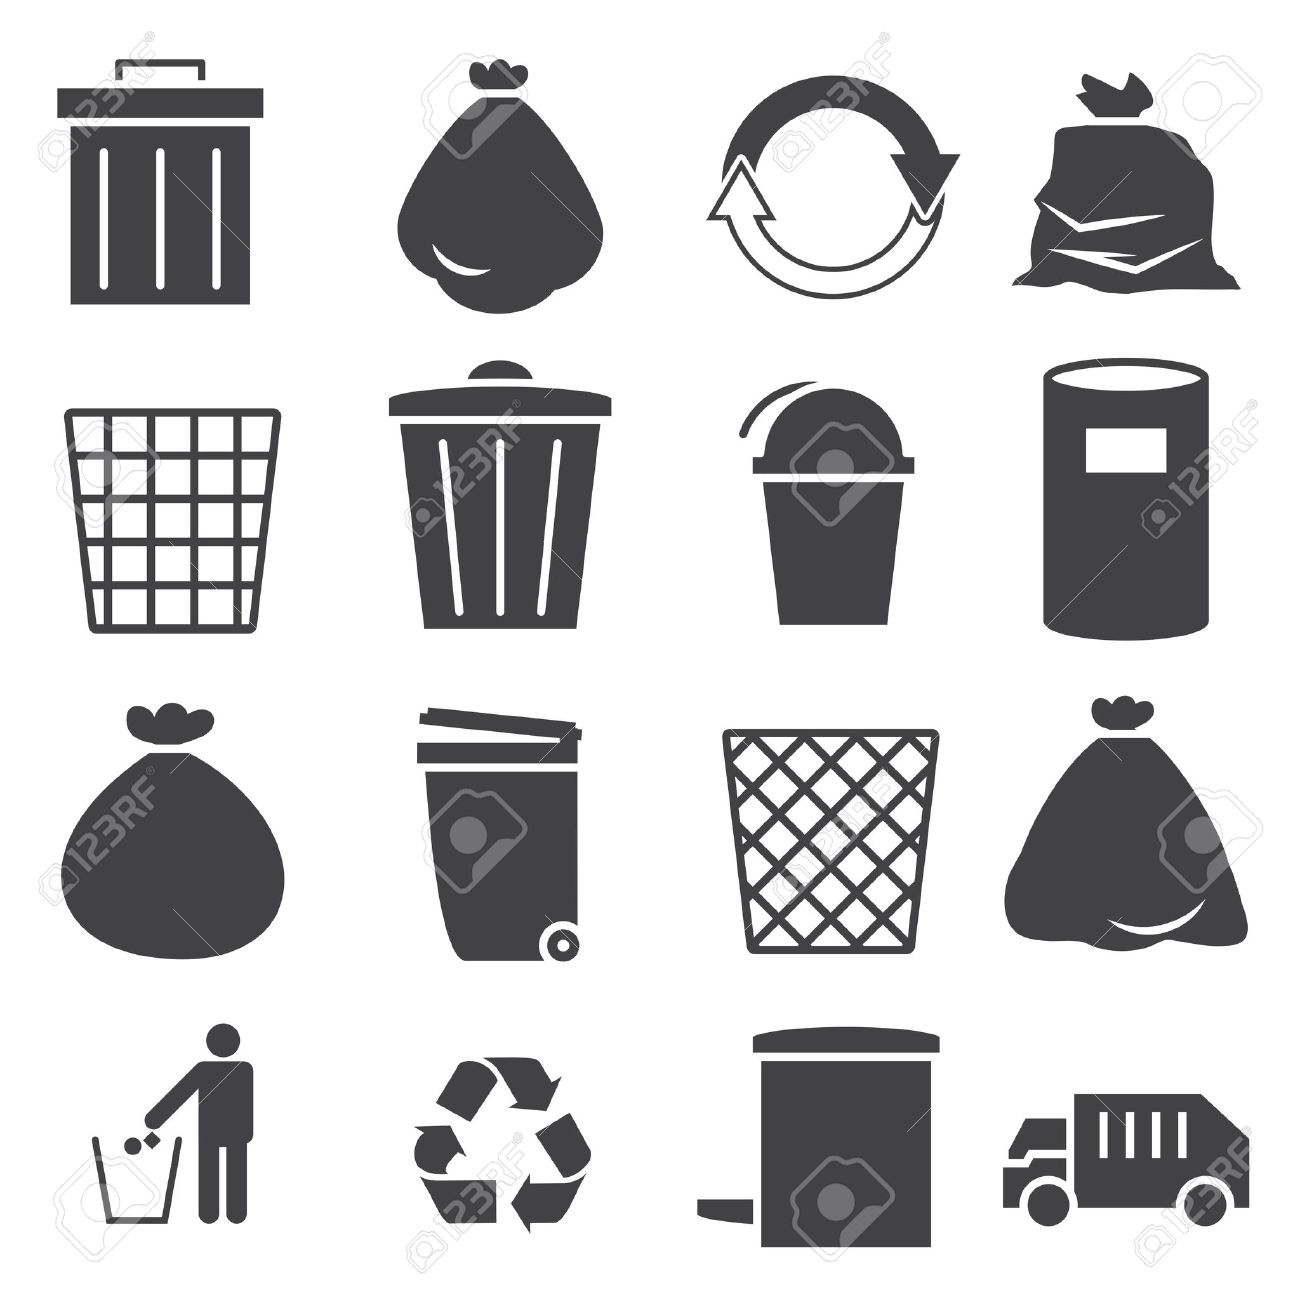 trashcan icon set - 39842169